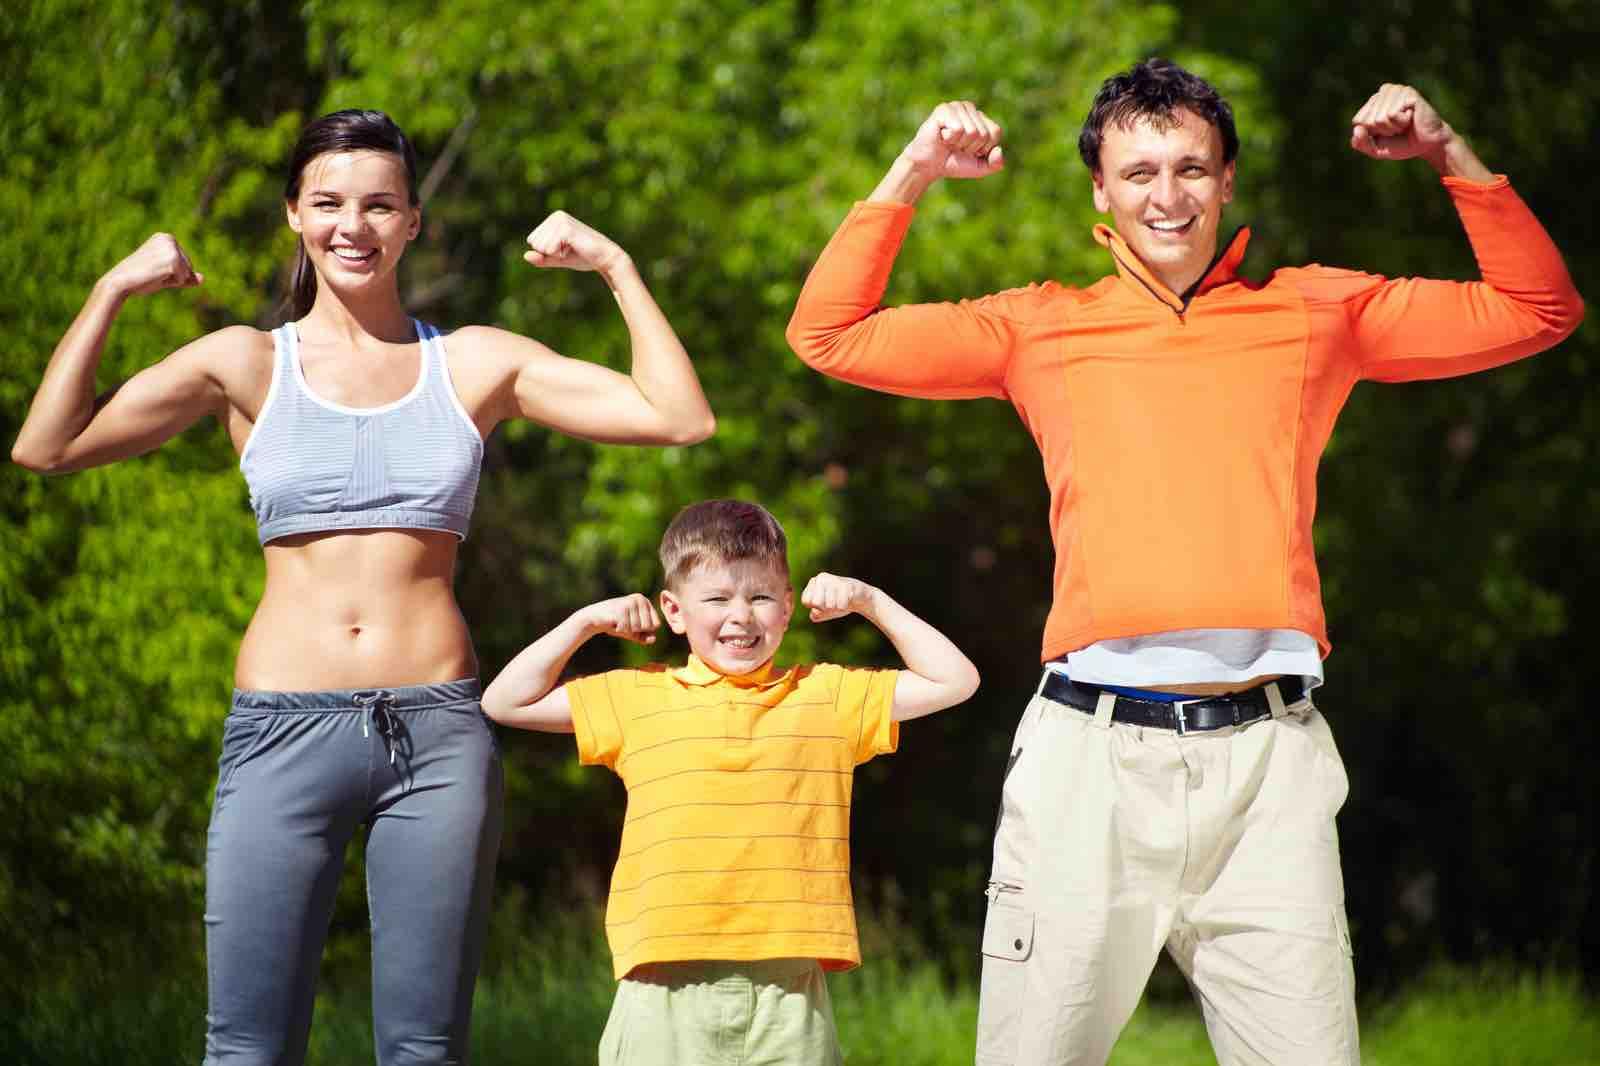 Marbella family fitness blog health fitness tips - Marbella family fun ...